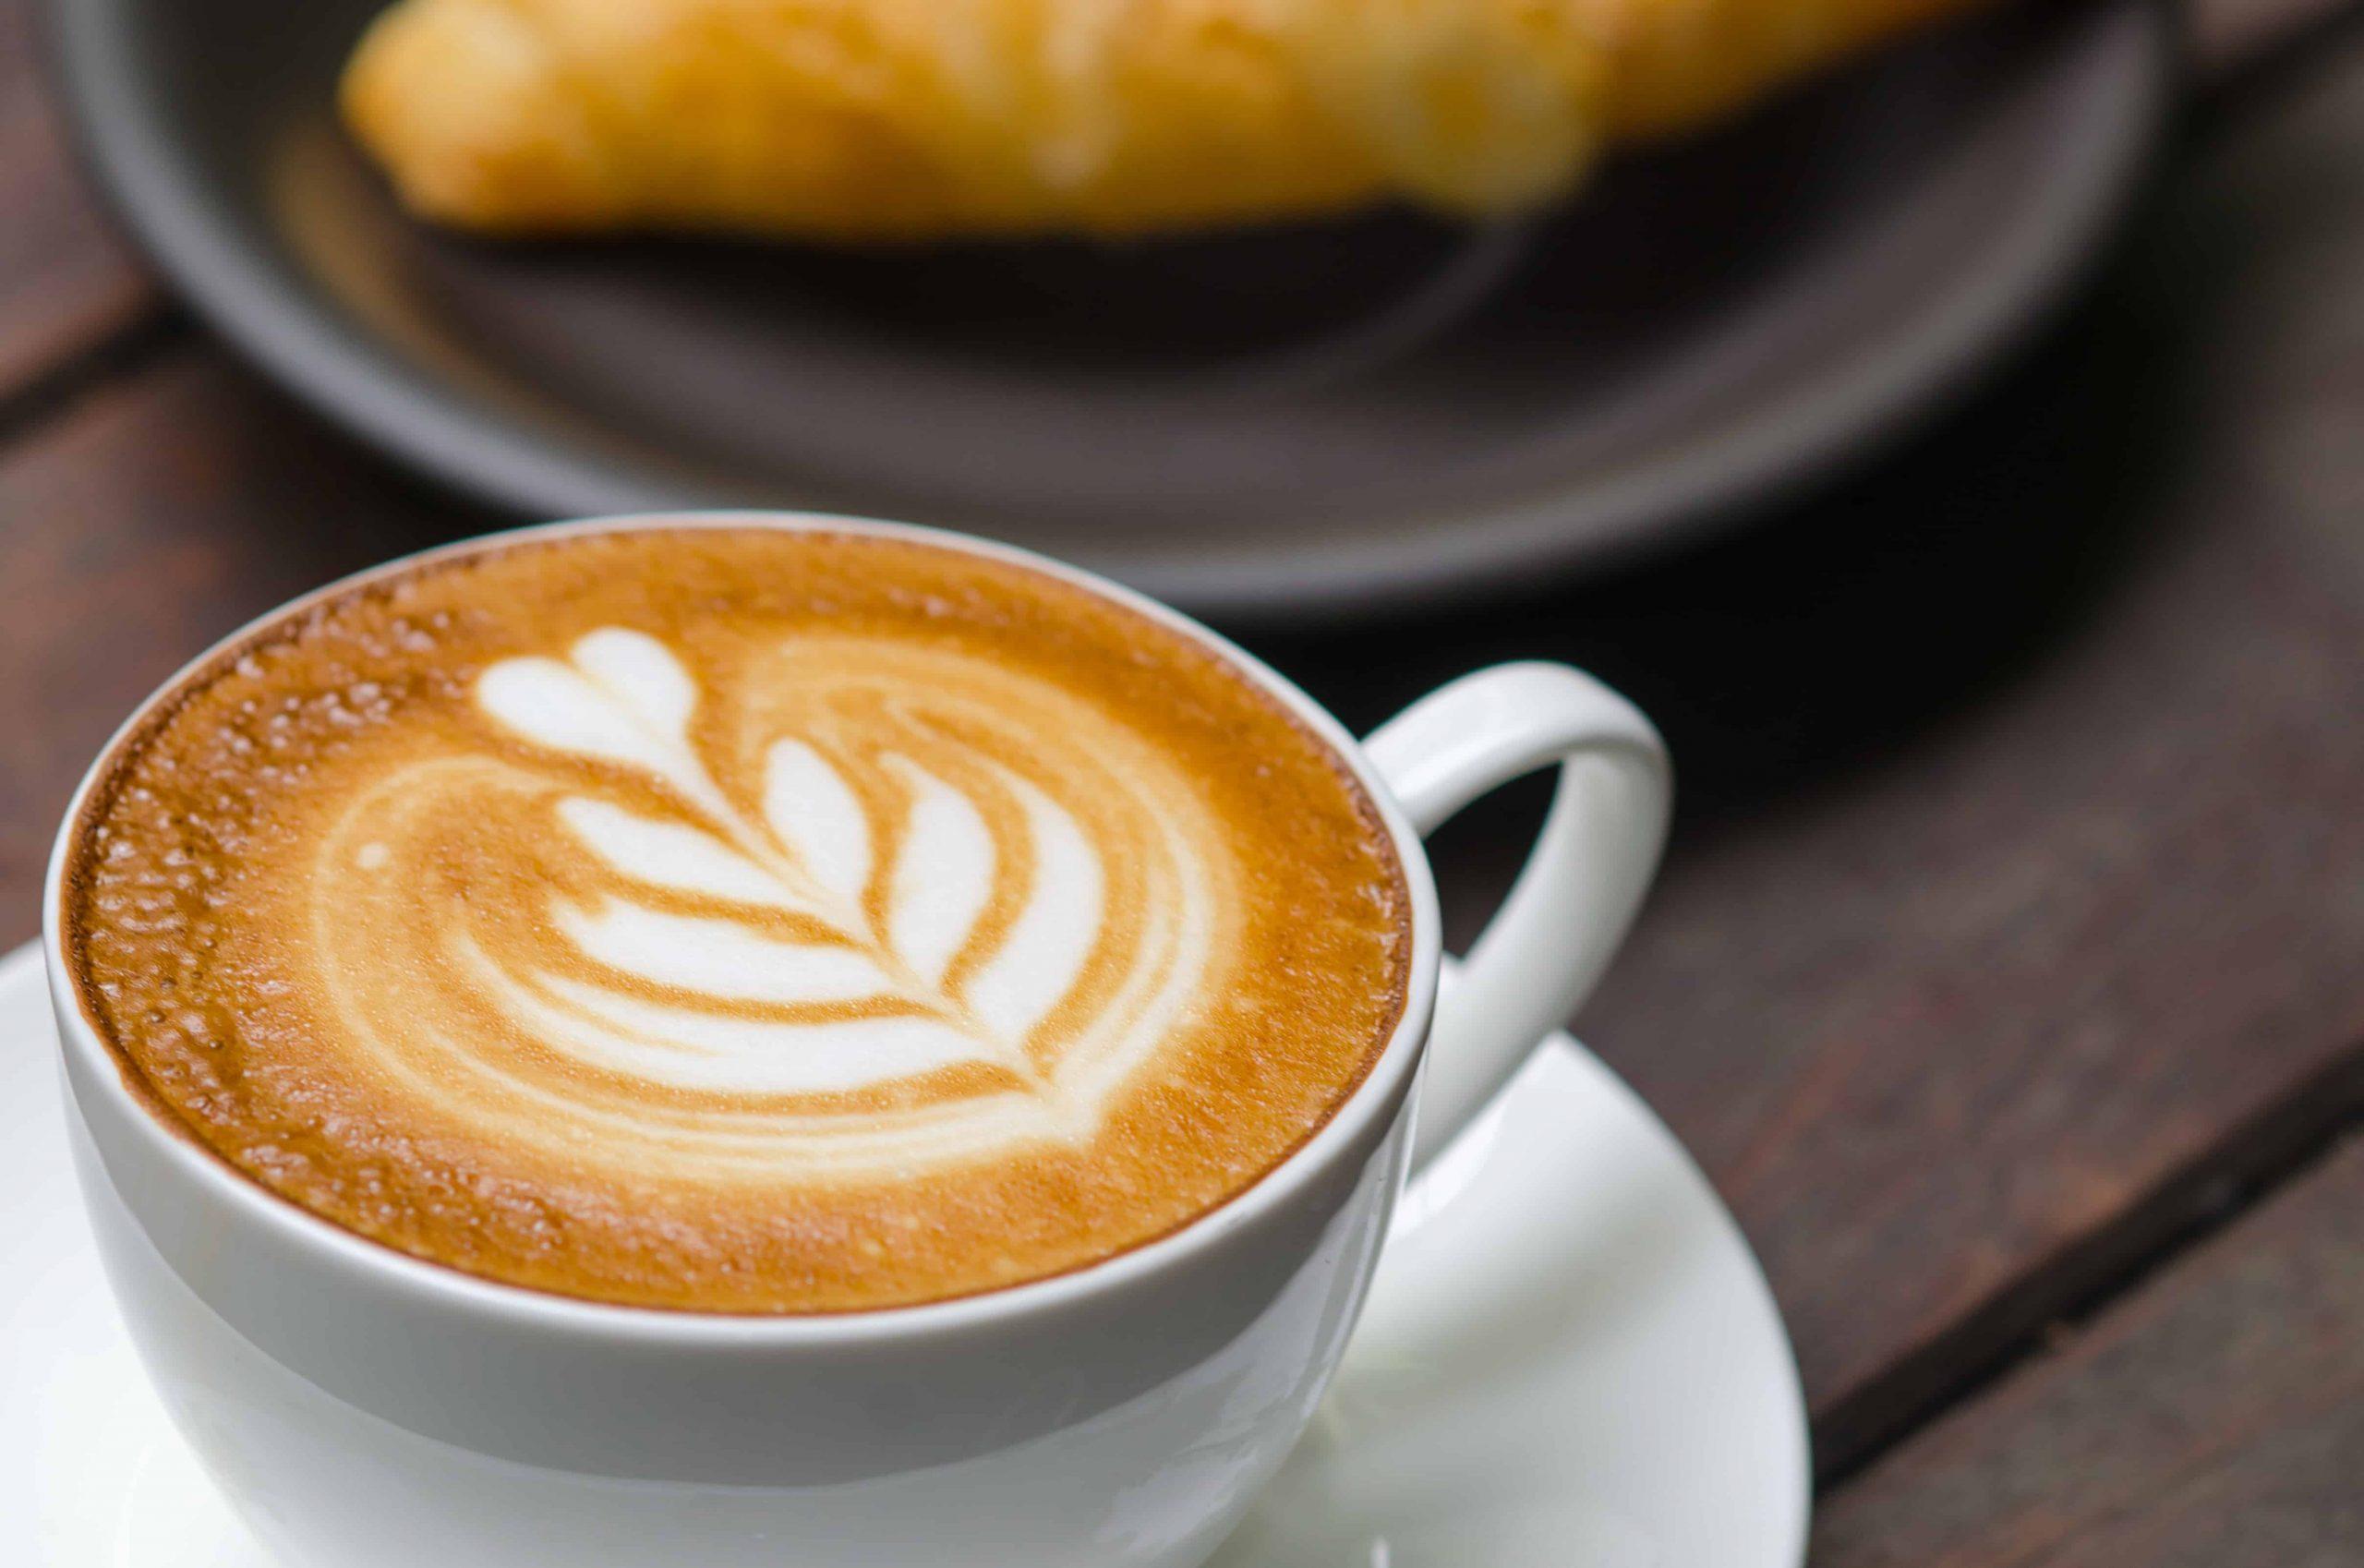 Tazza di caffè macchiato